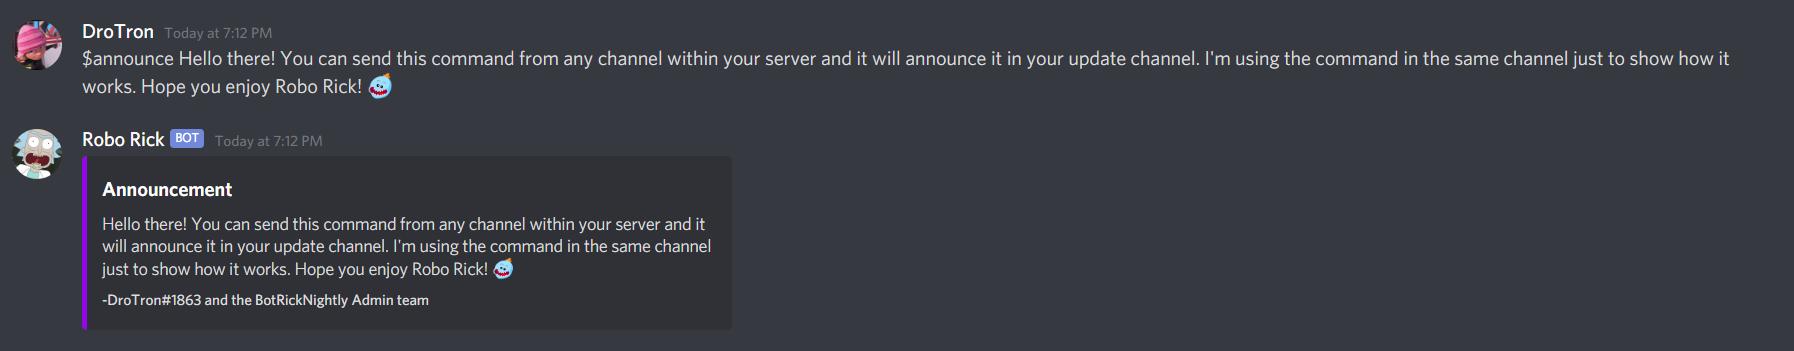 AnnouncementsImage